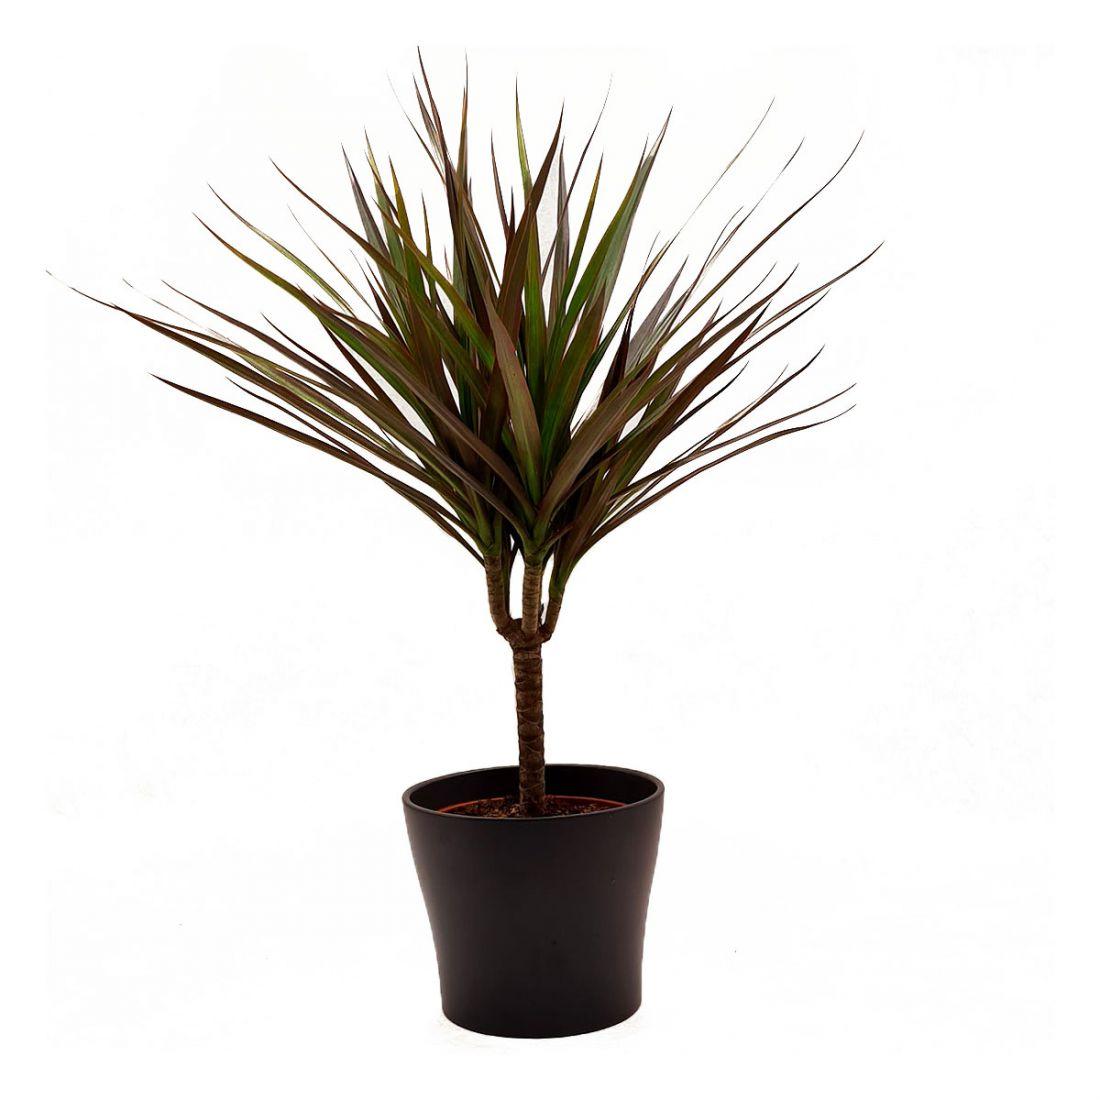 Vazoninis augalas DRACENA (DRACENA), be vazono